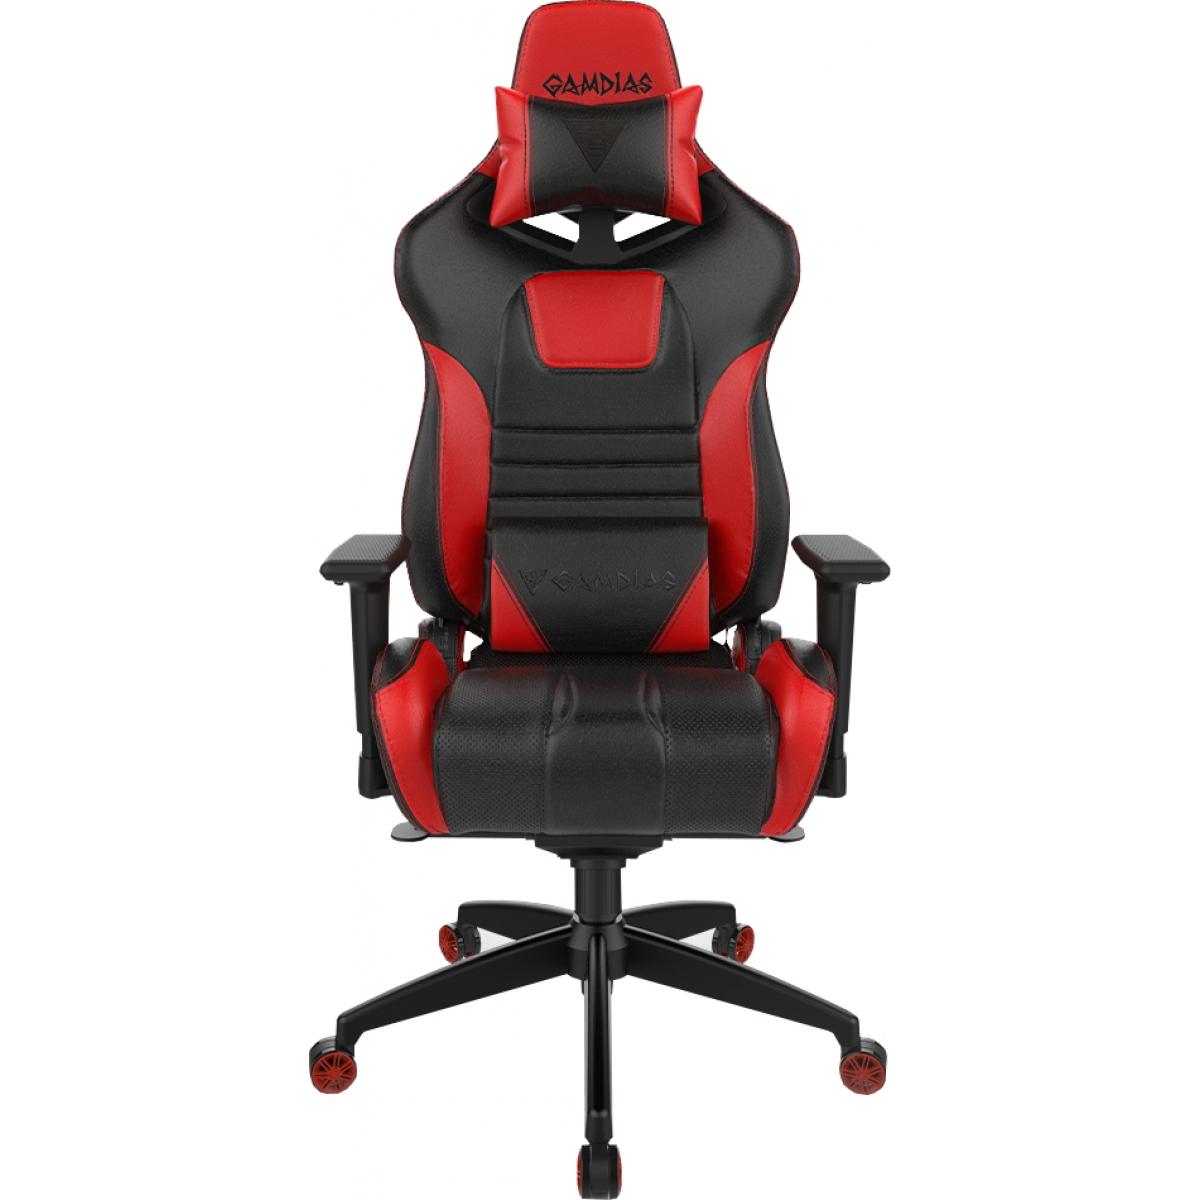 Cadeira Gamer Gamdias Achilles RGB M1A, Black-Red, GD-ACHILLESM1ALBR